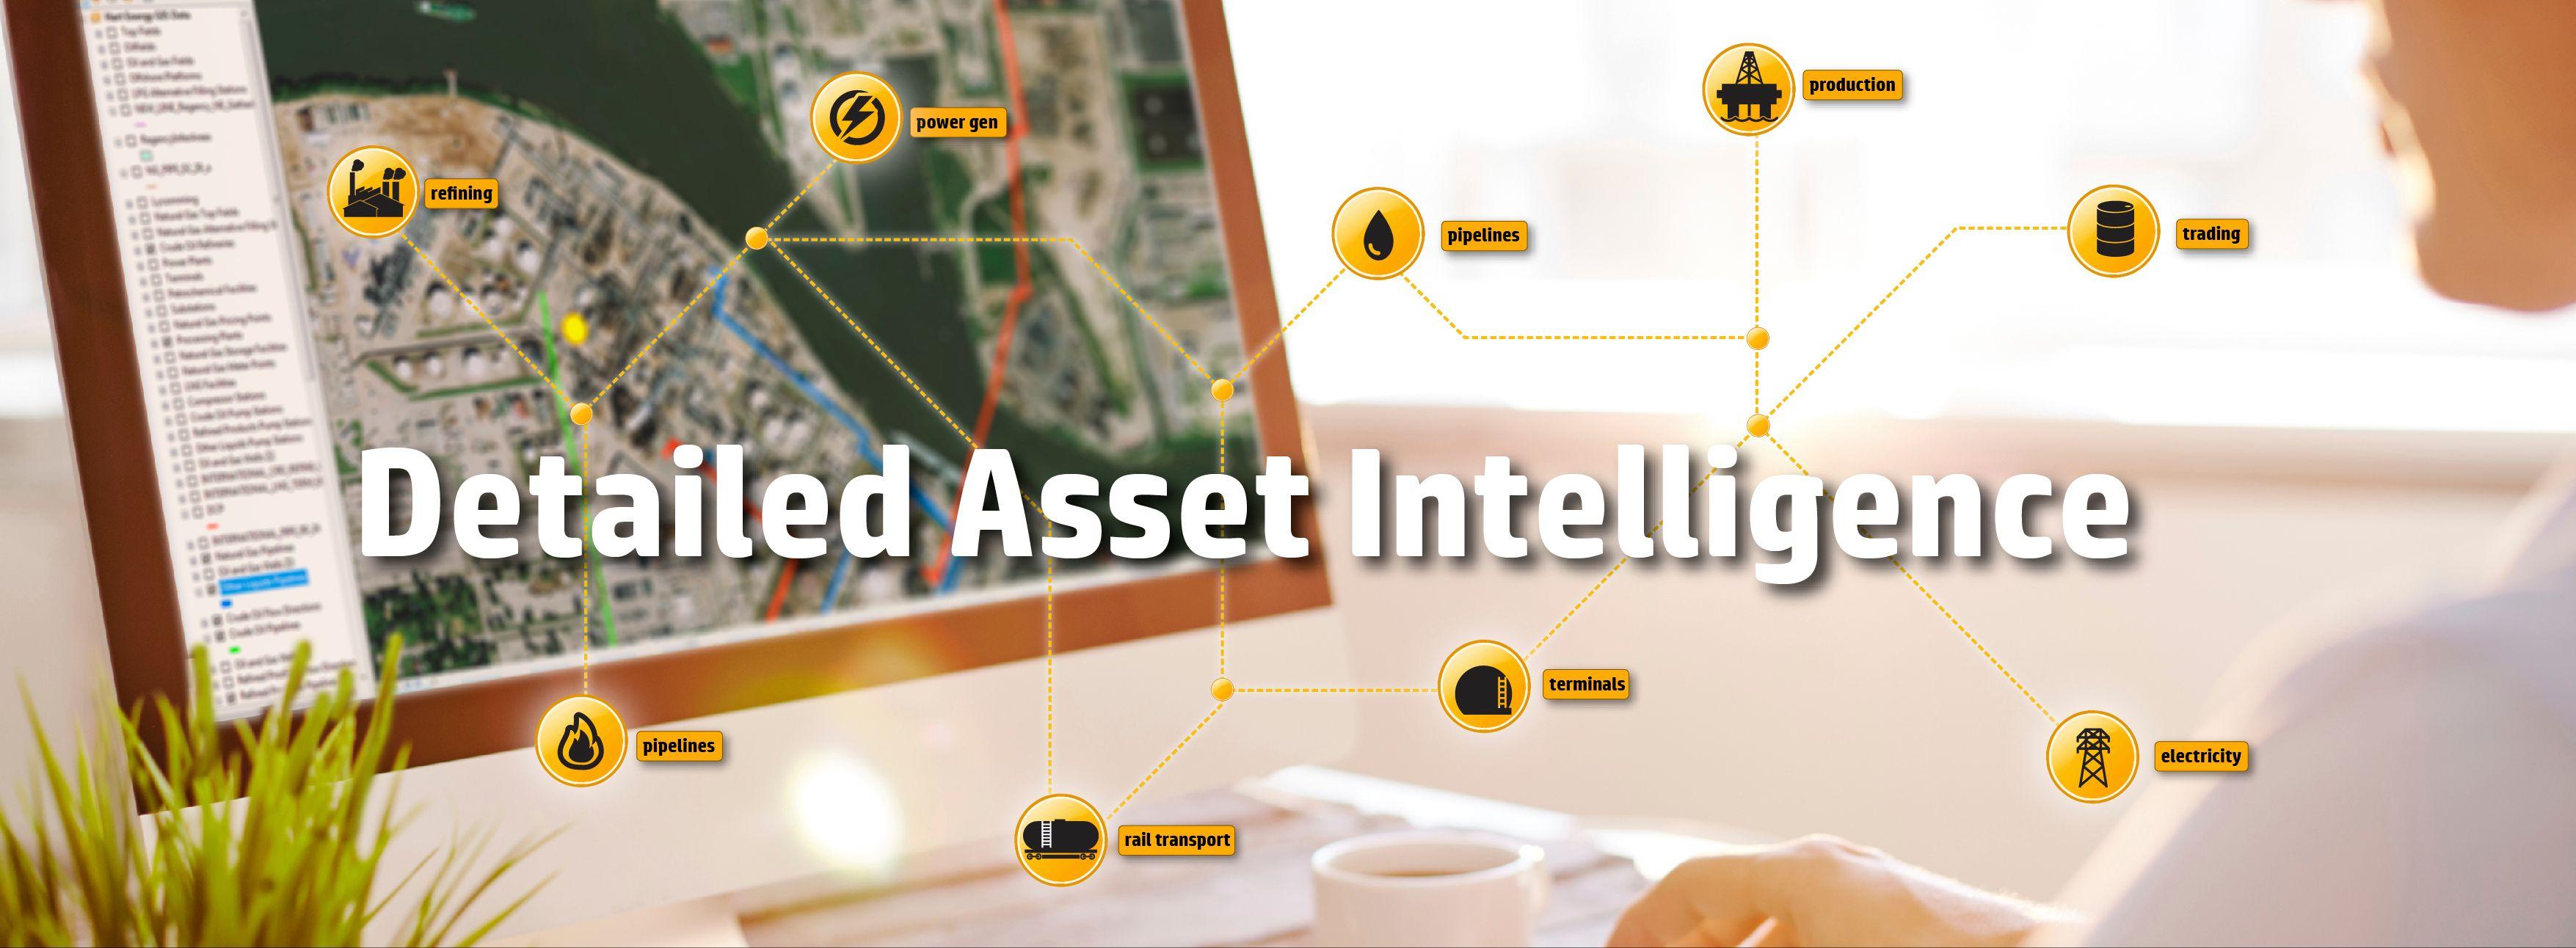 https://images2.rextag.com/public/Detailed-Asset-Intelligence